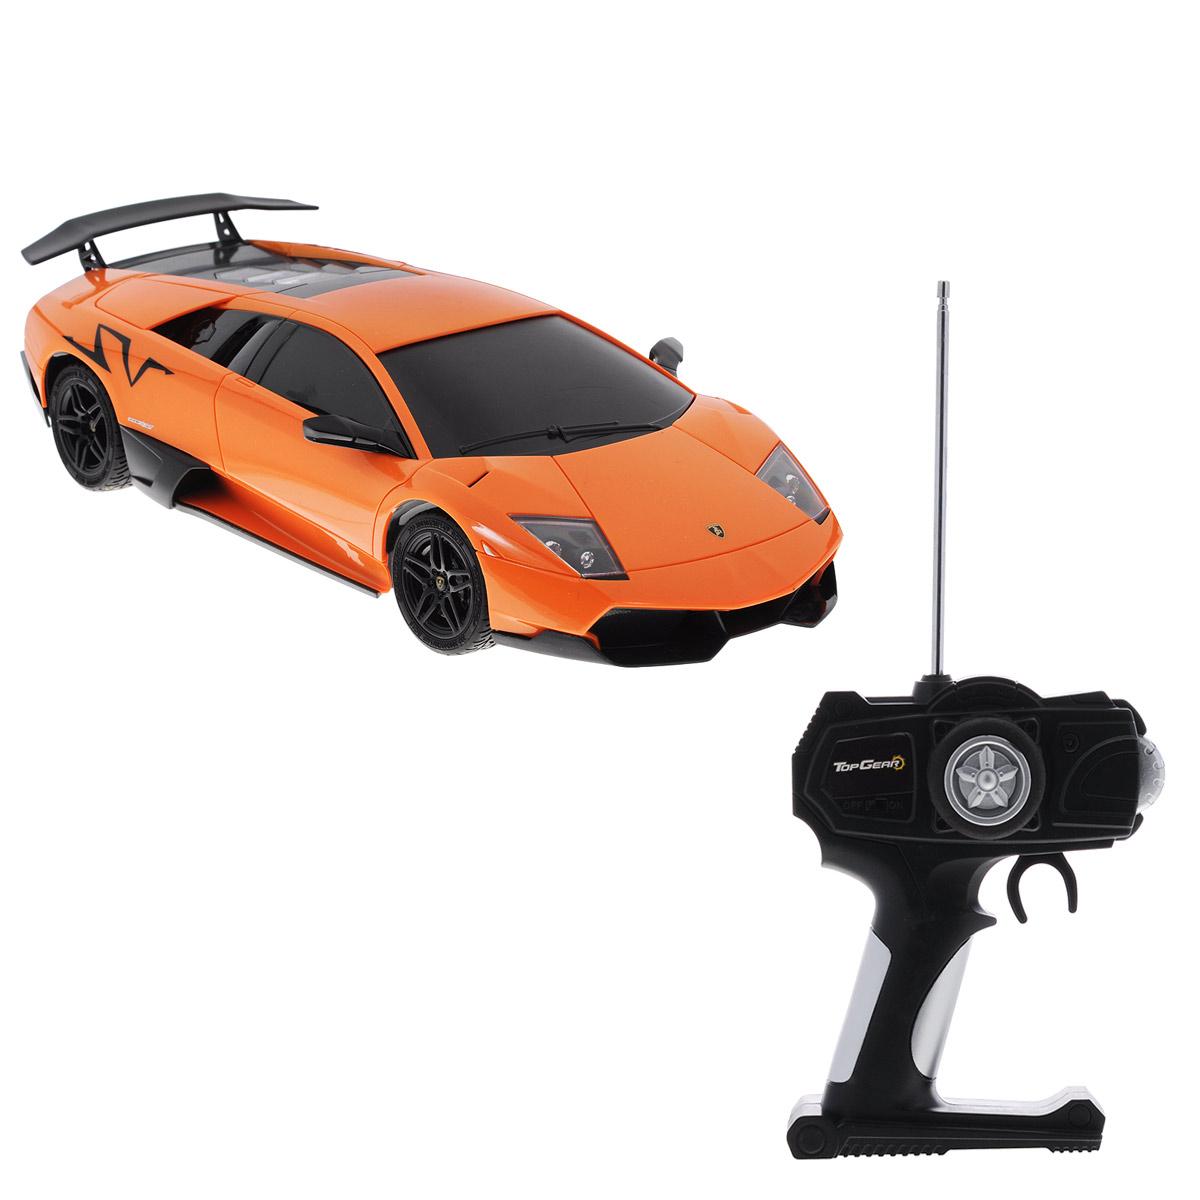 "���������������� ������ ���������� TopGear ""Lamborghini Murcielago LP 670-4"", ����: ���������. ������� 1/18"